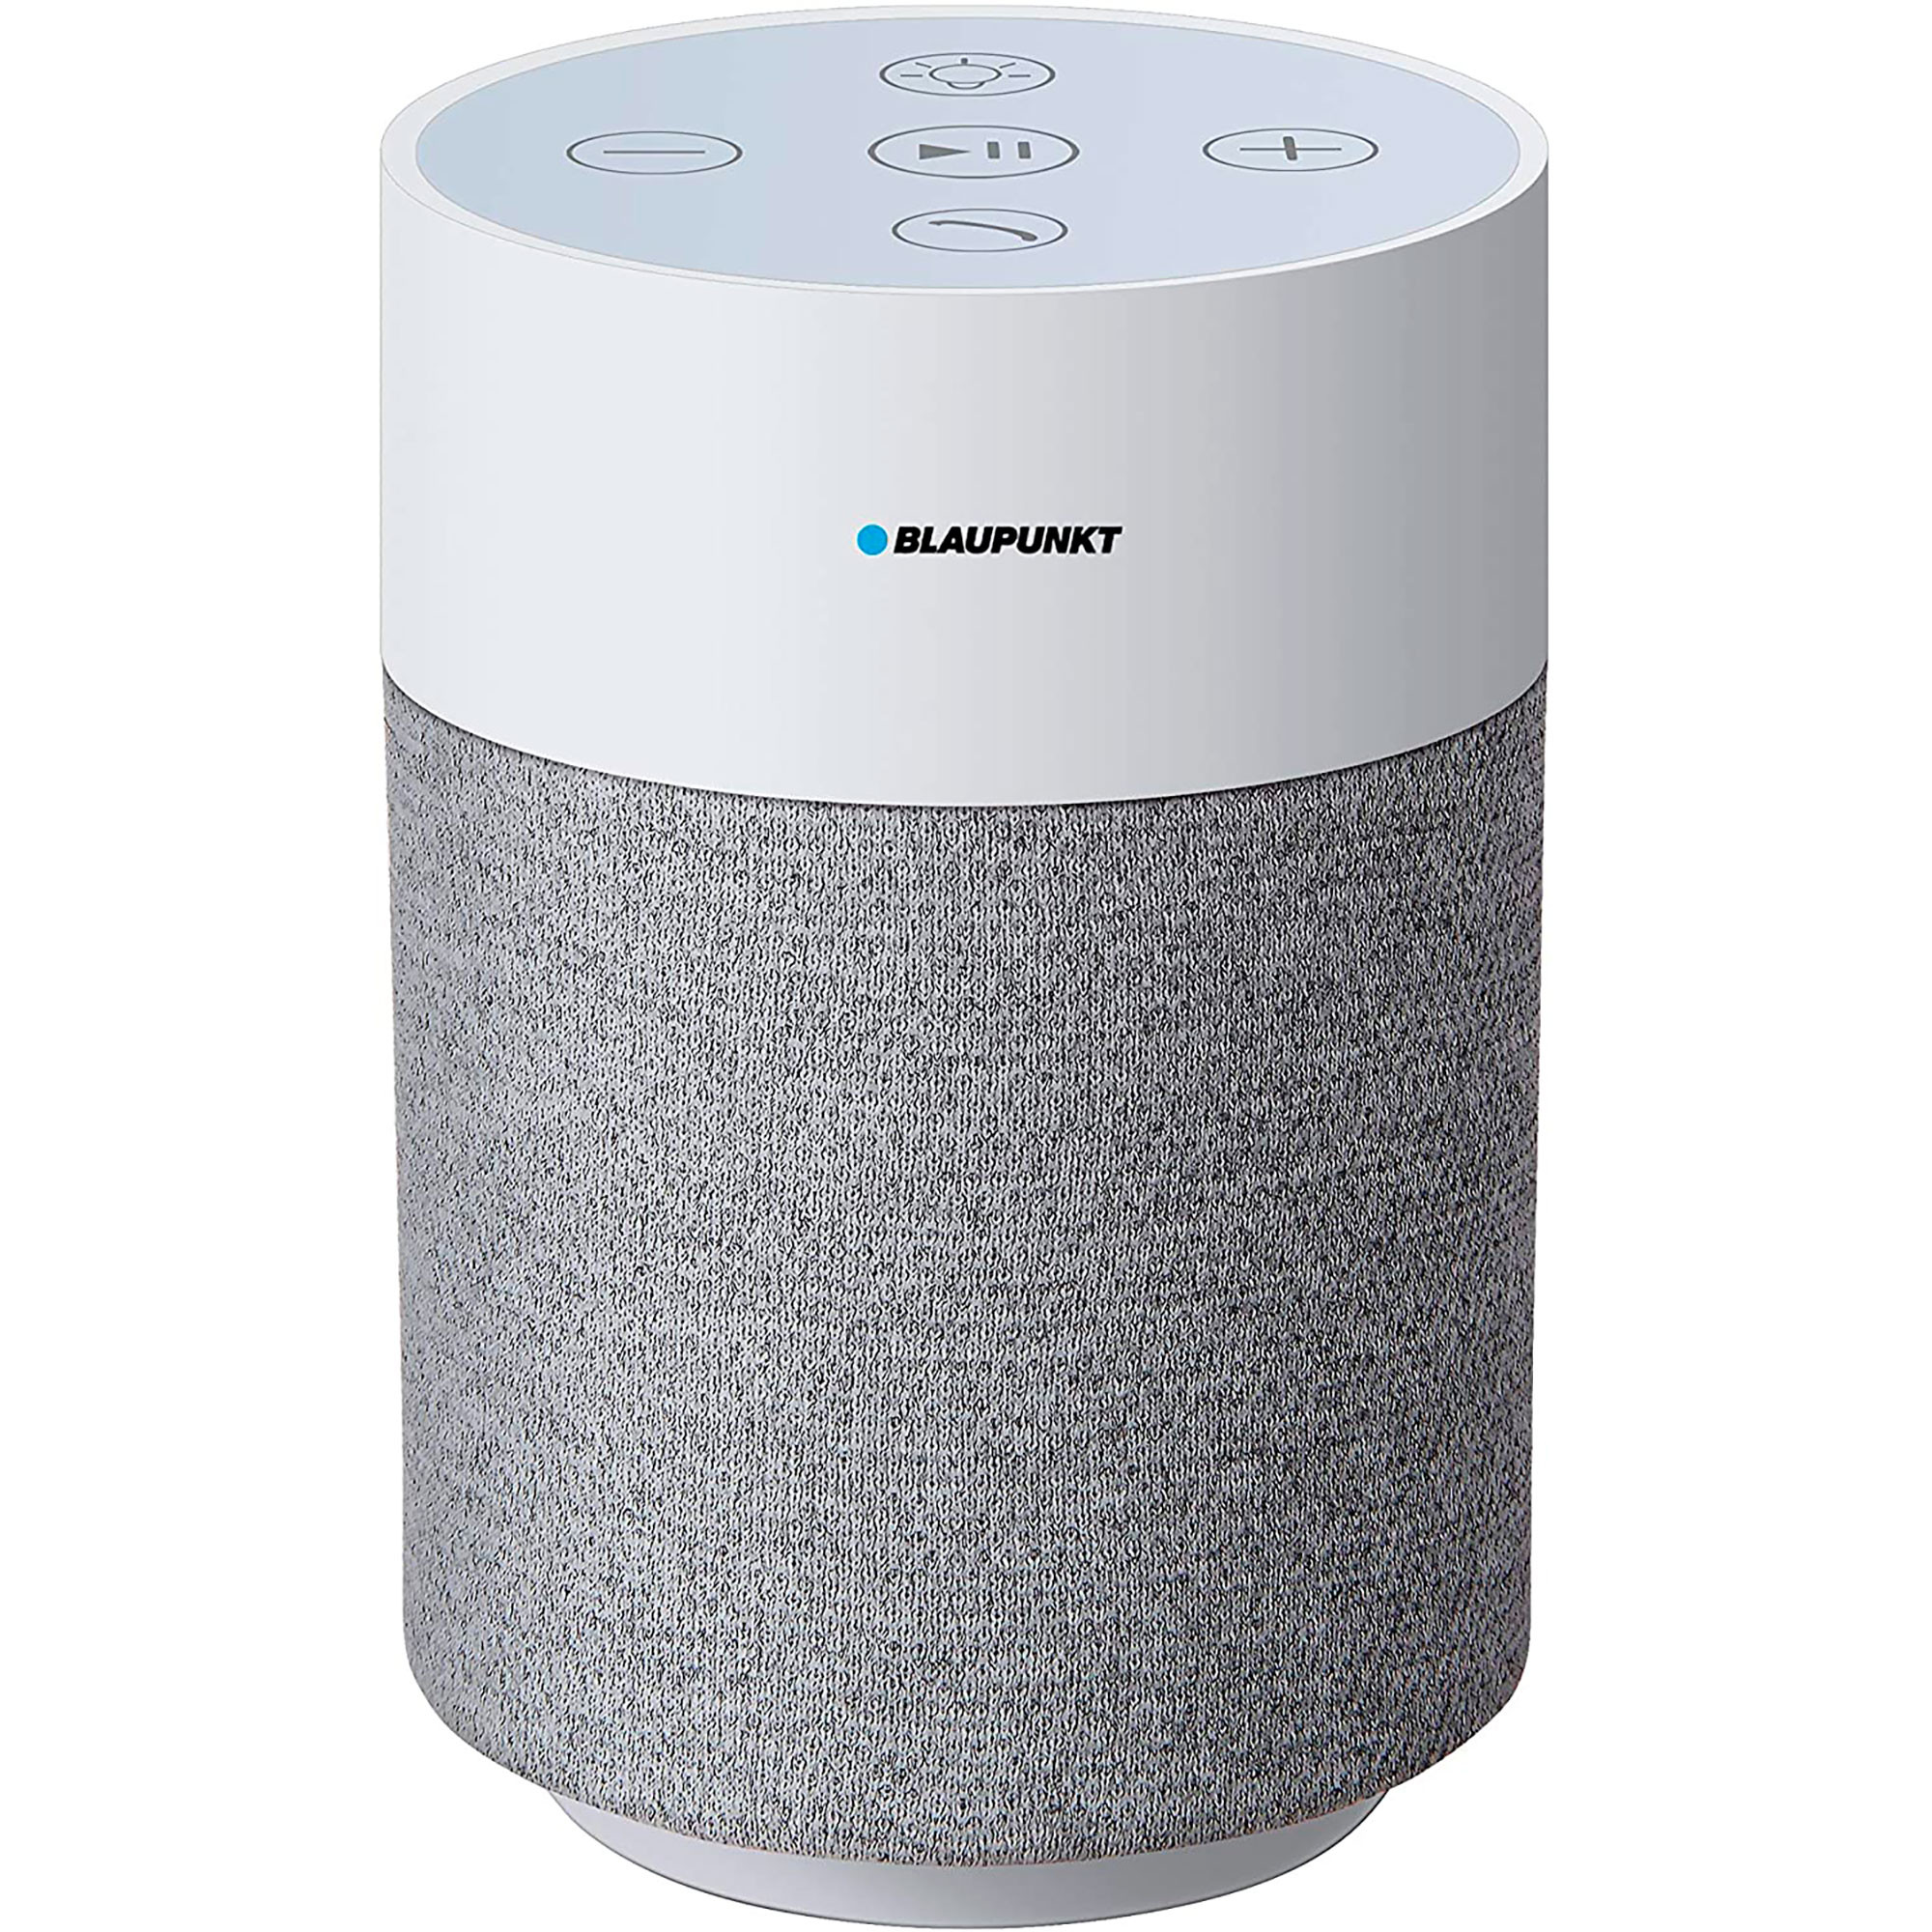 Blaupunkt BLP3830.112 Altavoz Bluetooth Portátil, Luz Led, Táctil, Micro SD, AUX, Potencia Sonido 5W, Blanco